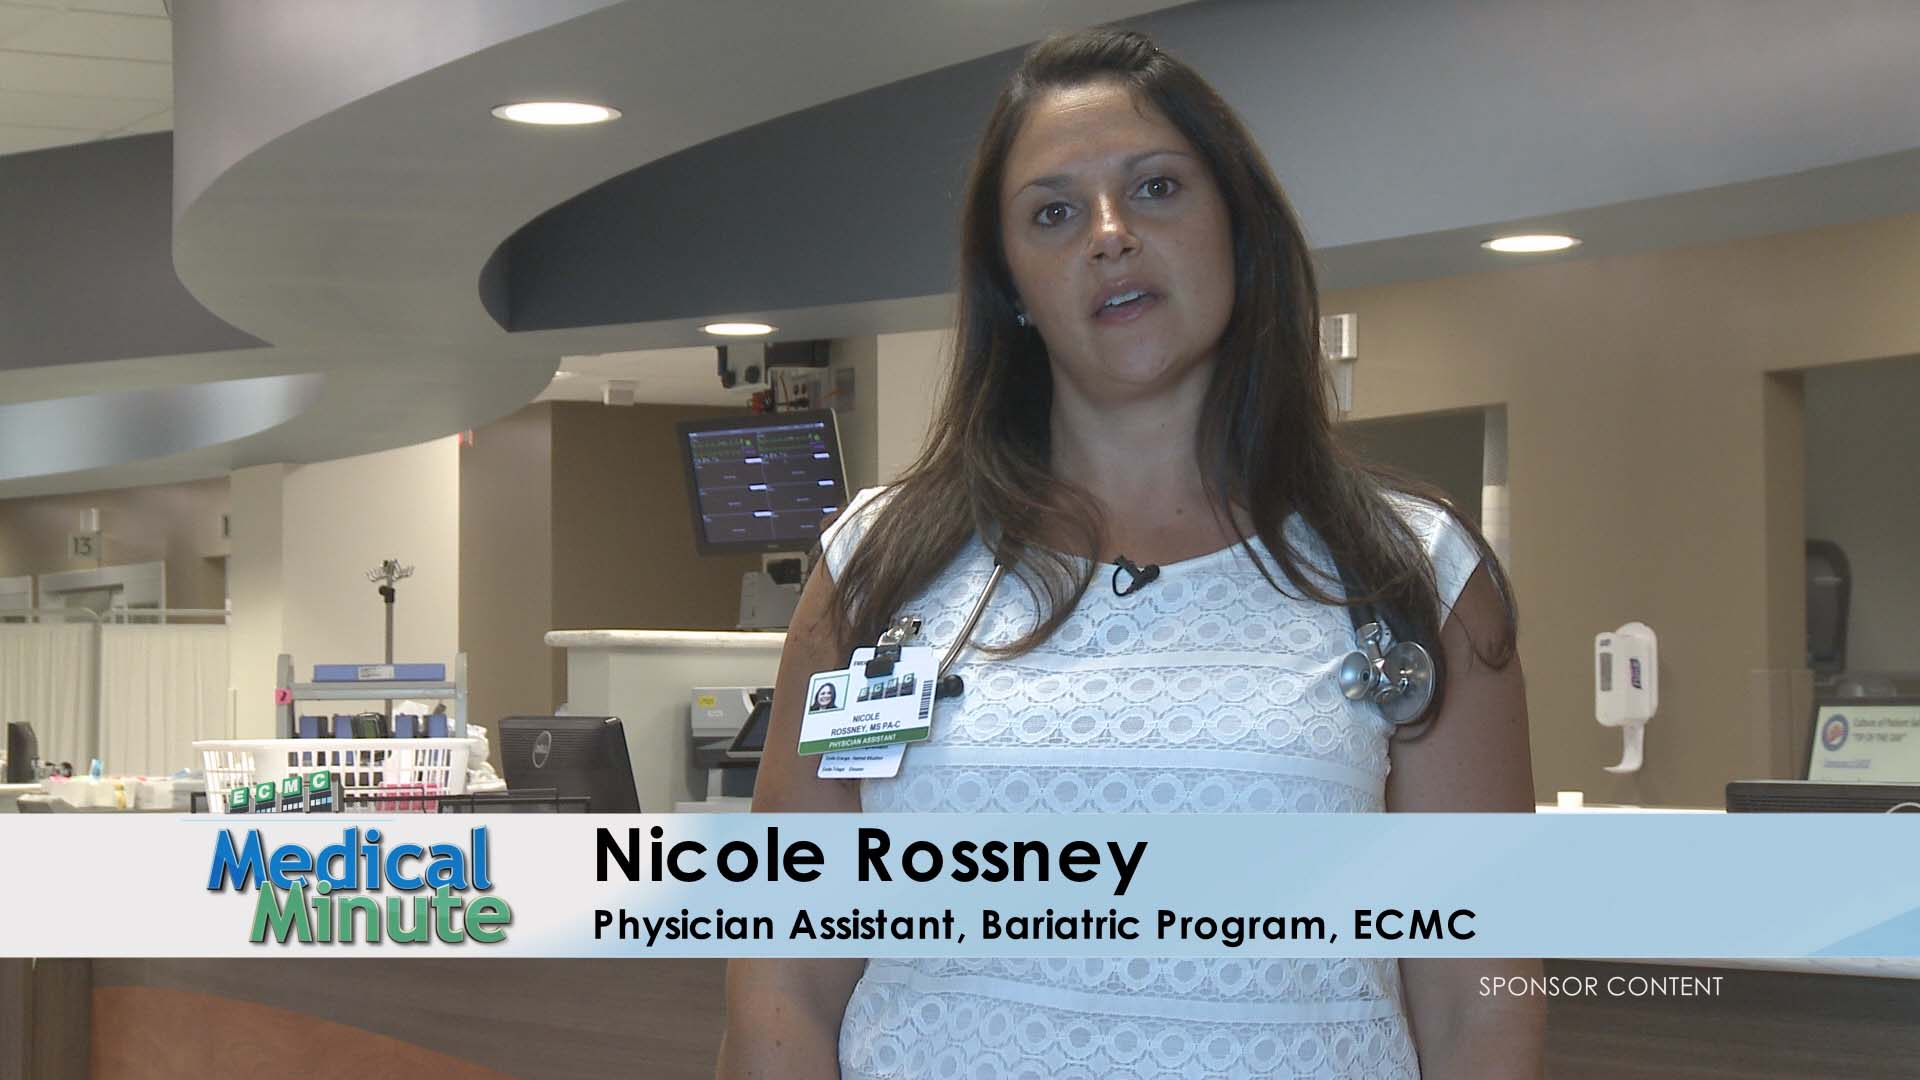 ECMC MEDICAL MINUTE NICOLE ROSSNEY OBESITY 01.01.18 STILL